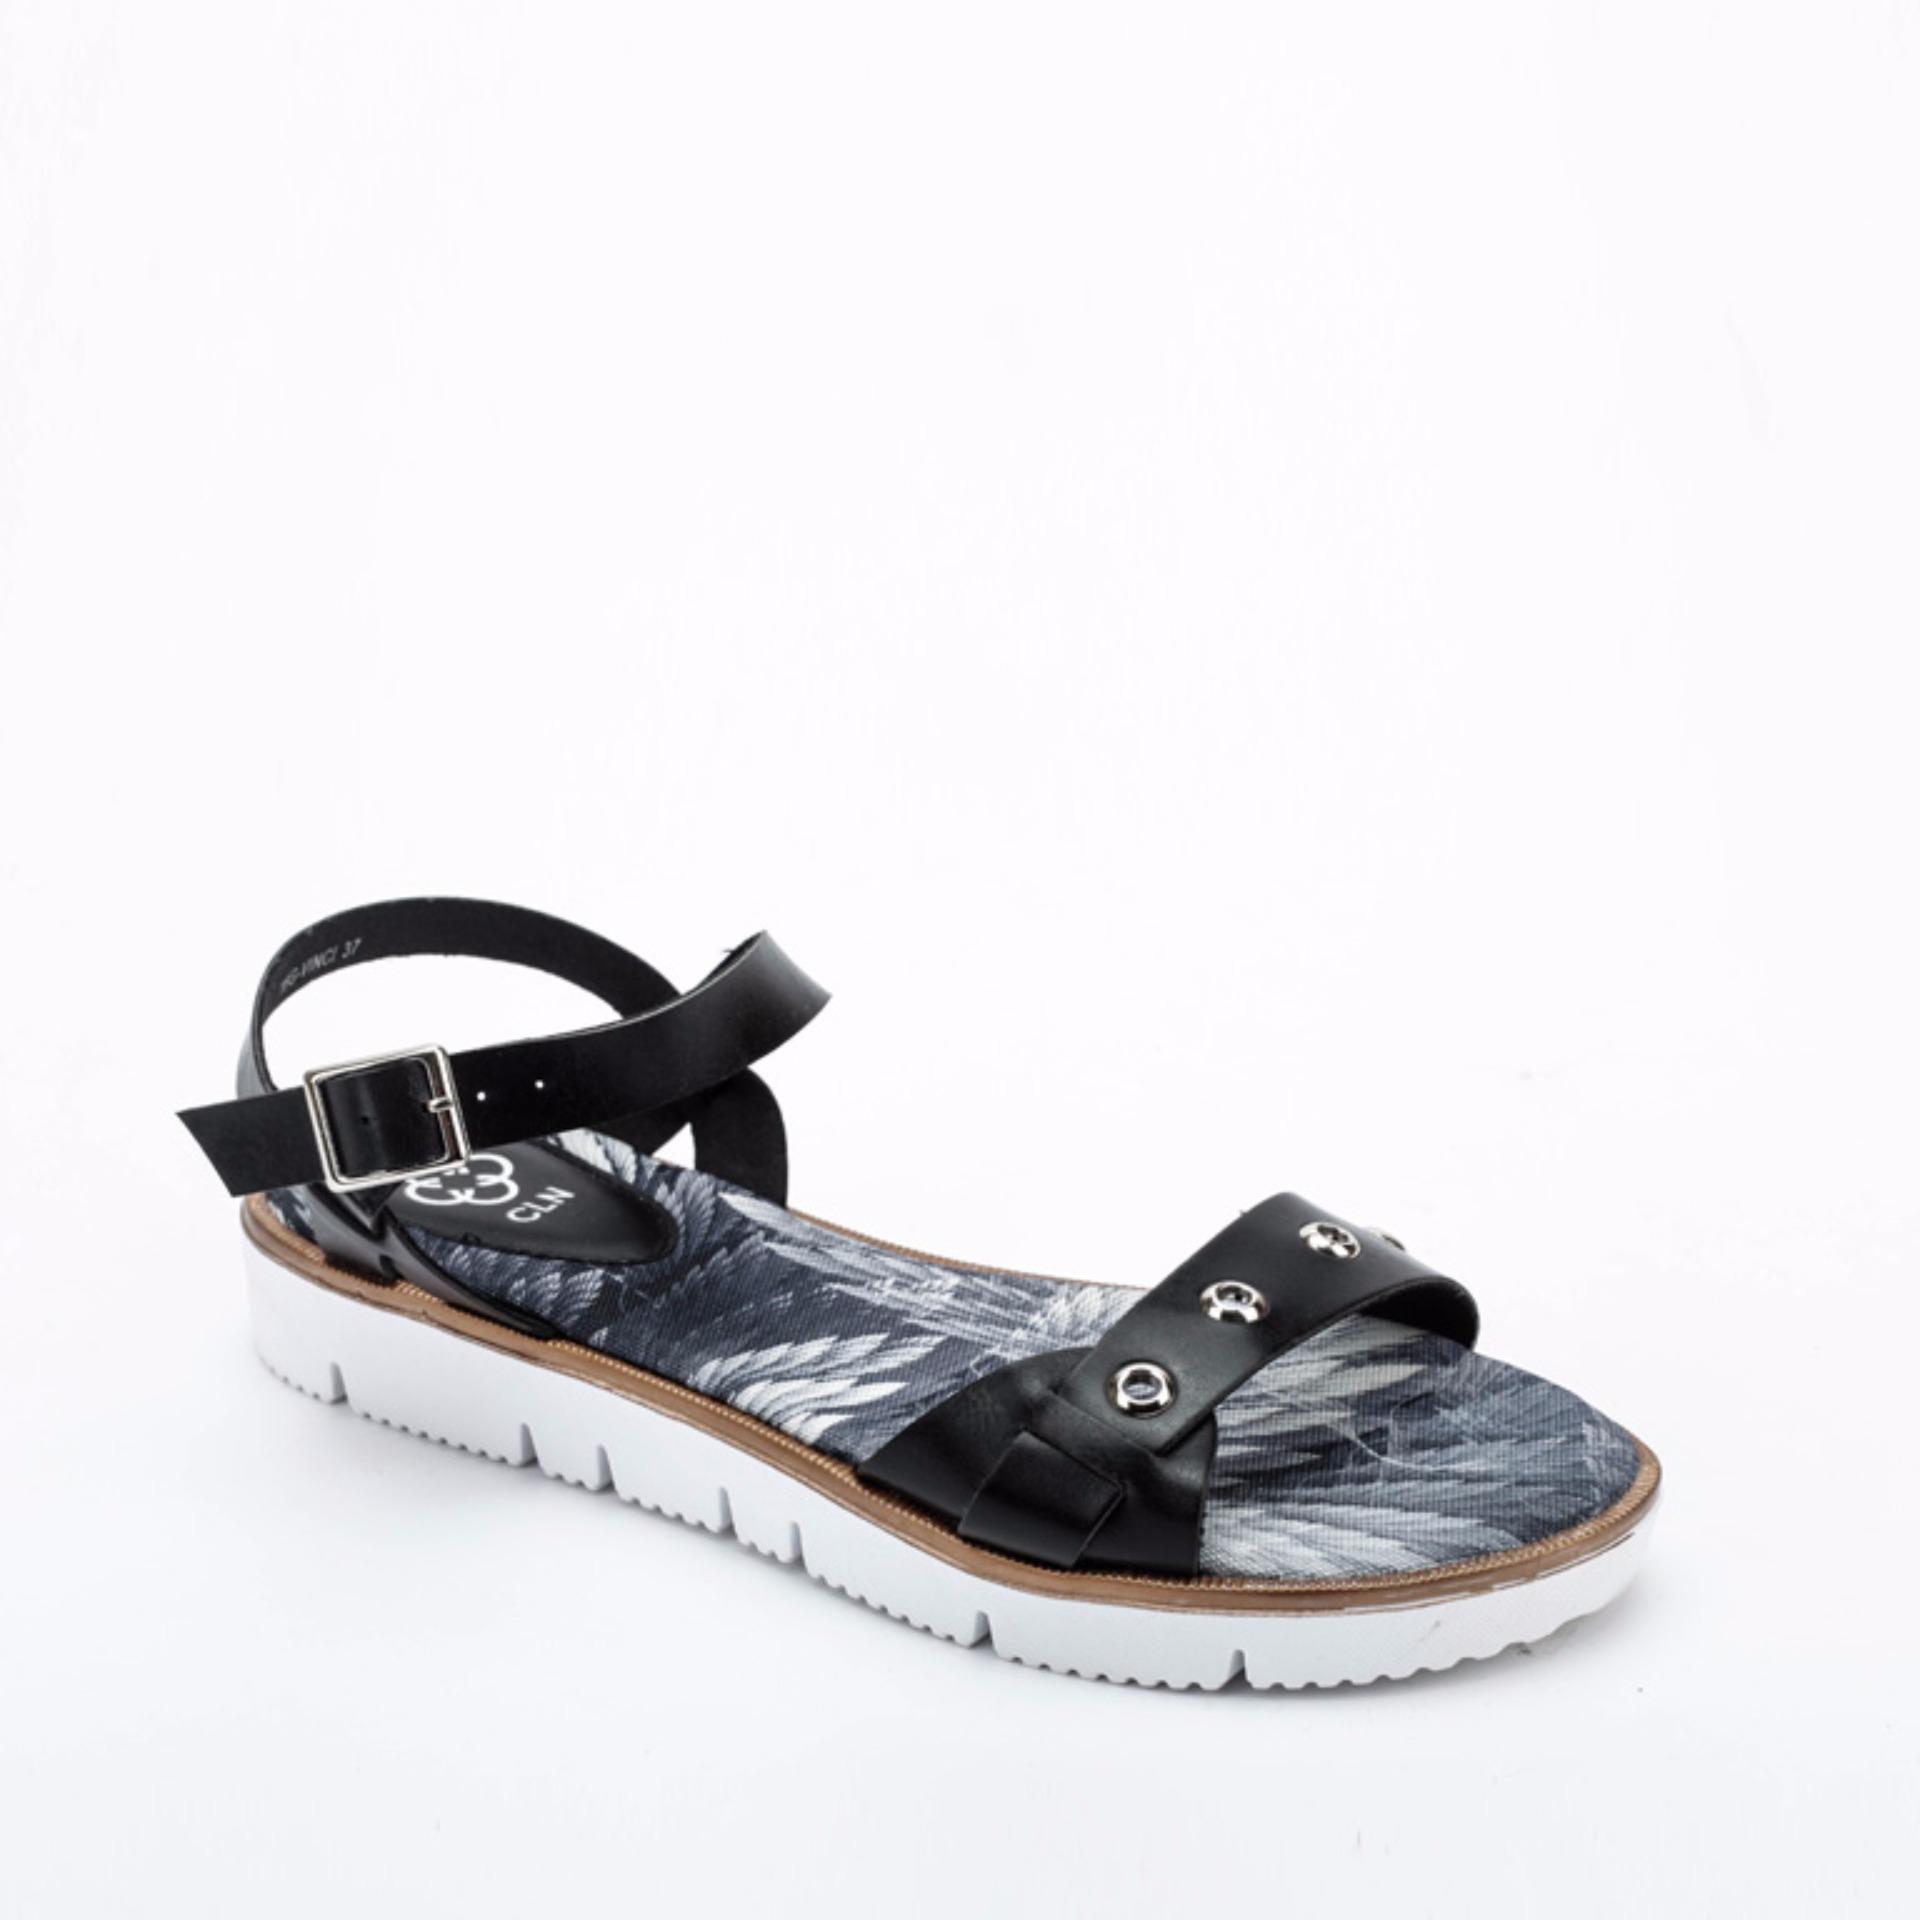 Cln shoes sandals philippines - Cln 16g Vinci Uniband Sandals With Angel Wings Design Black Lazada Ph